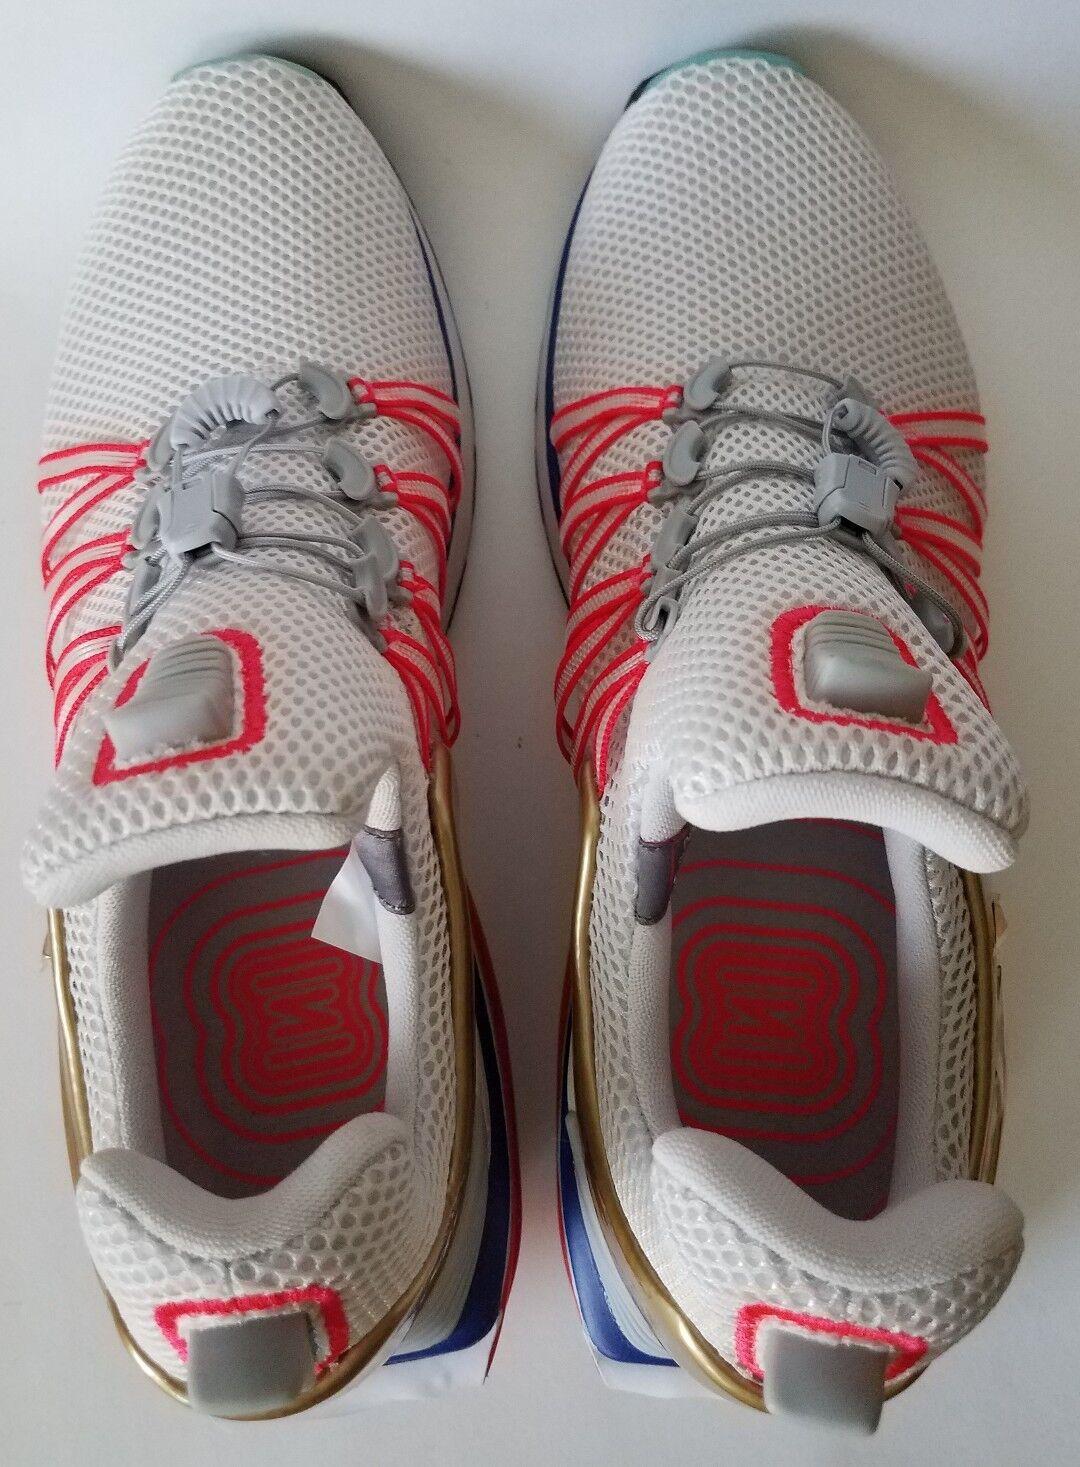 the best attitude 098a2 f3282 ... NEW Nike Shox Gravity Mens Mens Mens Olympic Shoe Sizes 10.5 Vast Grey  Metallic Gold 31615c ...